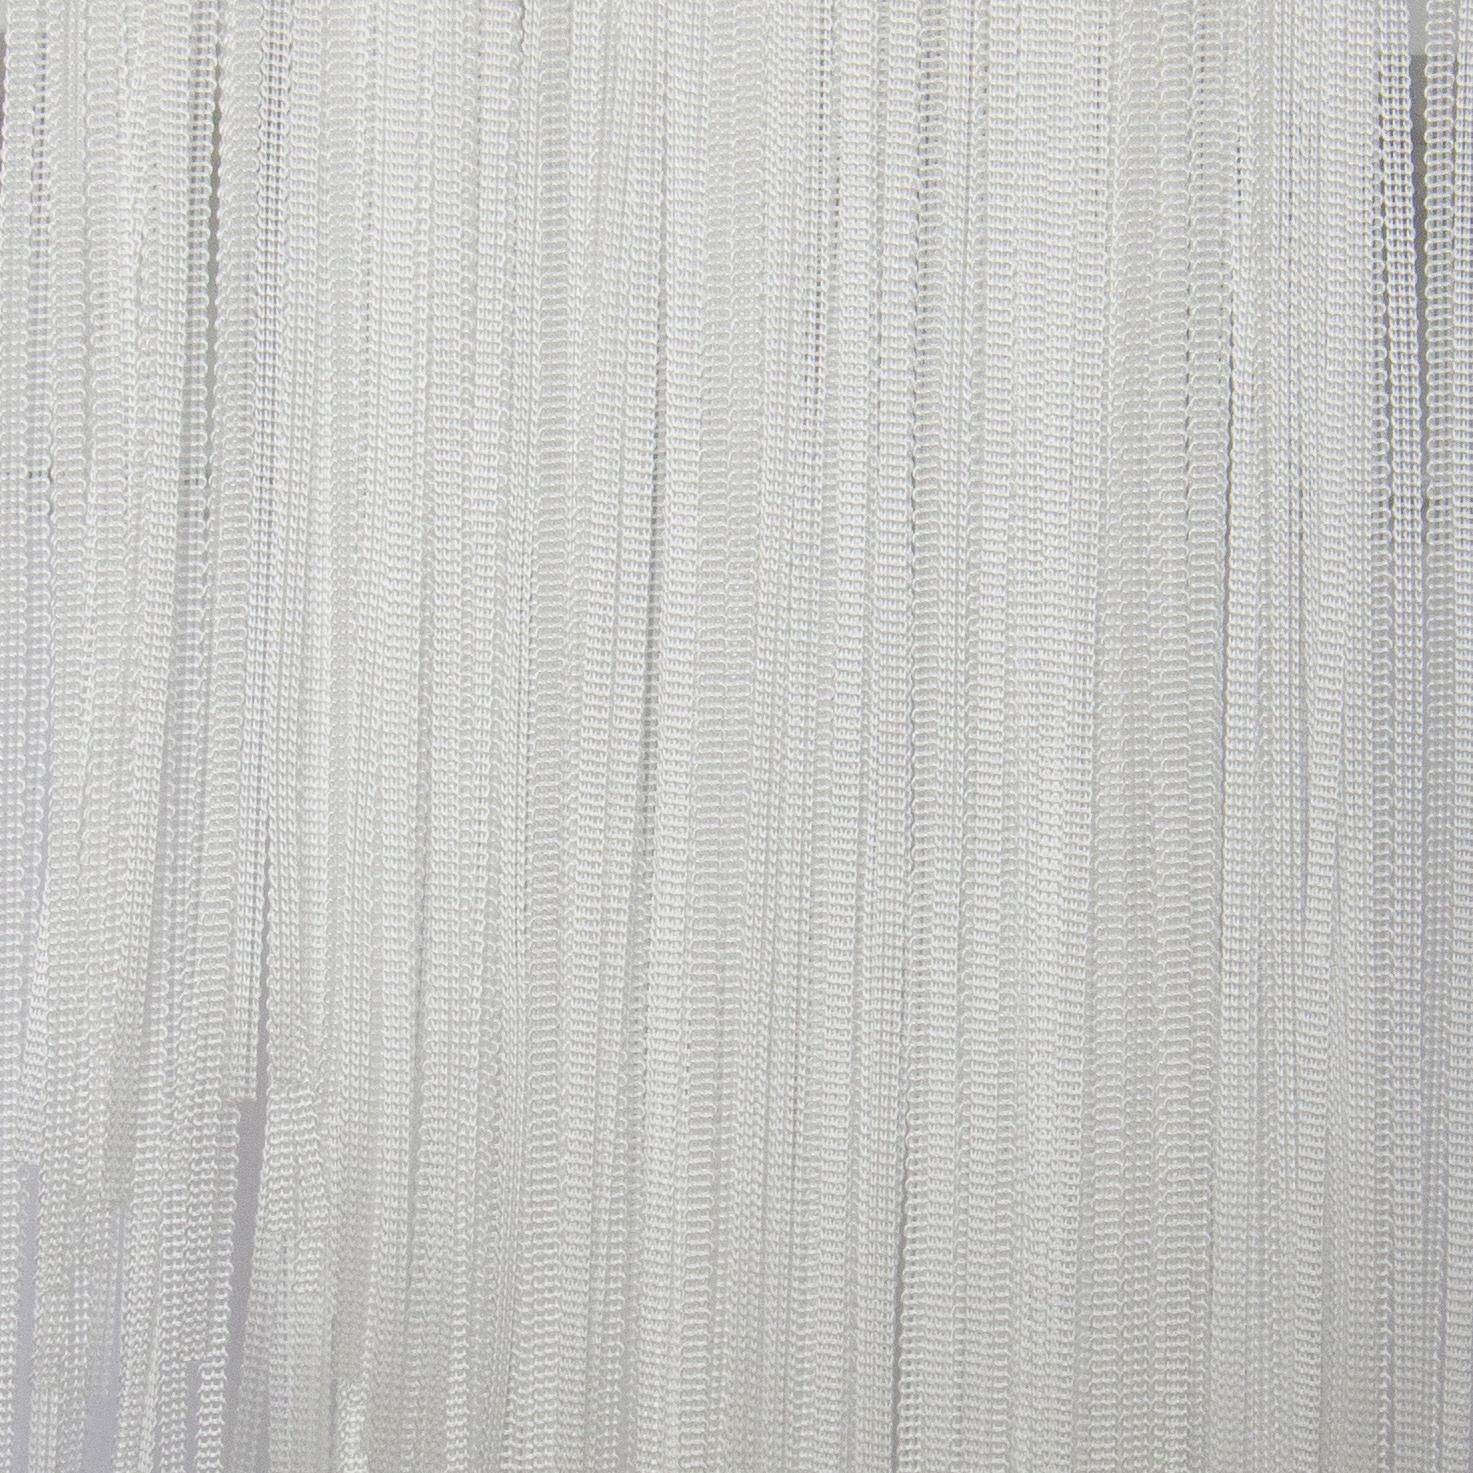 4601 Blance